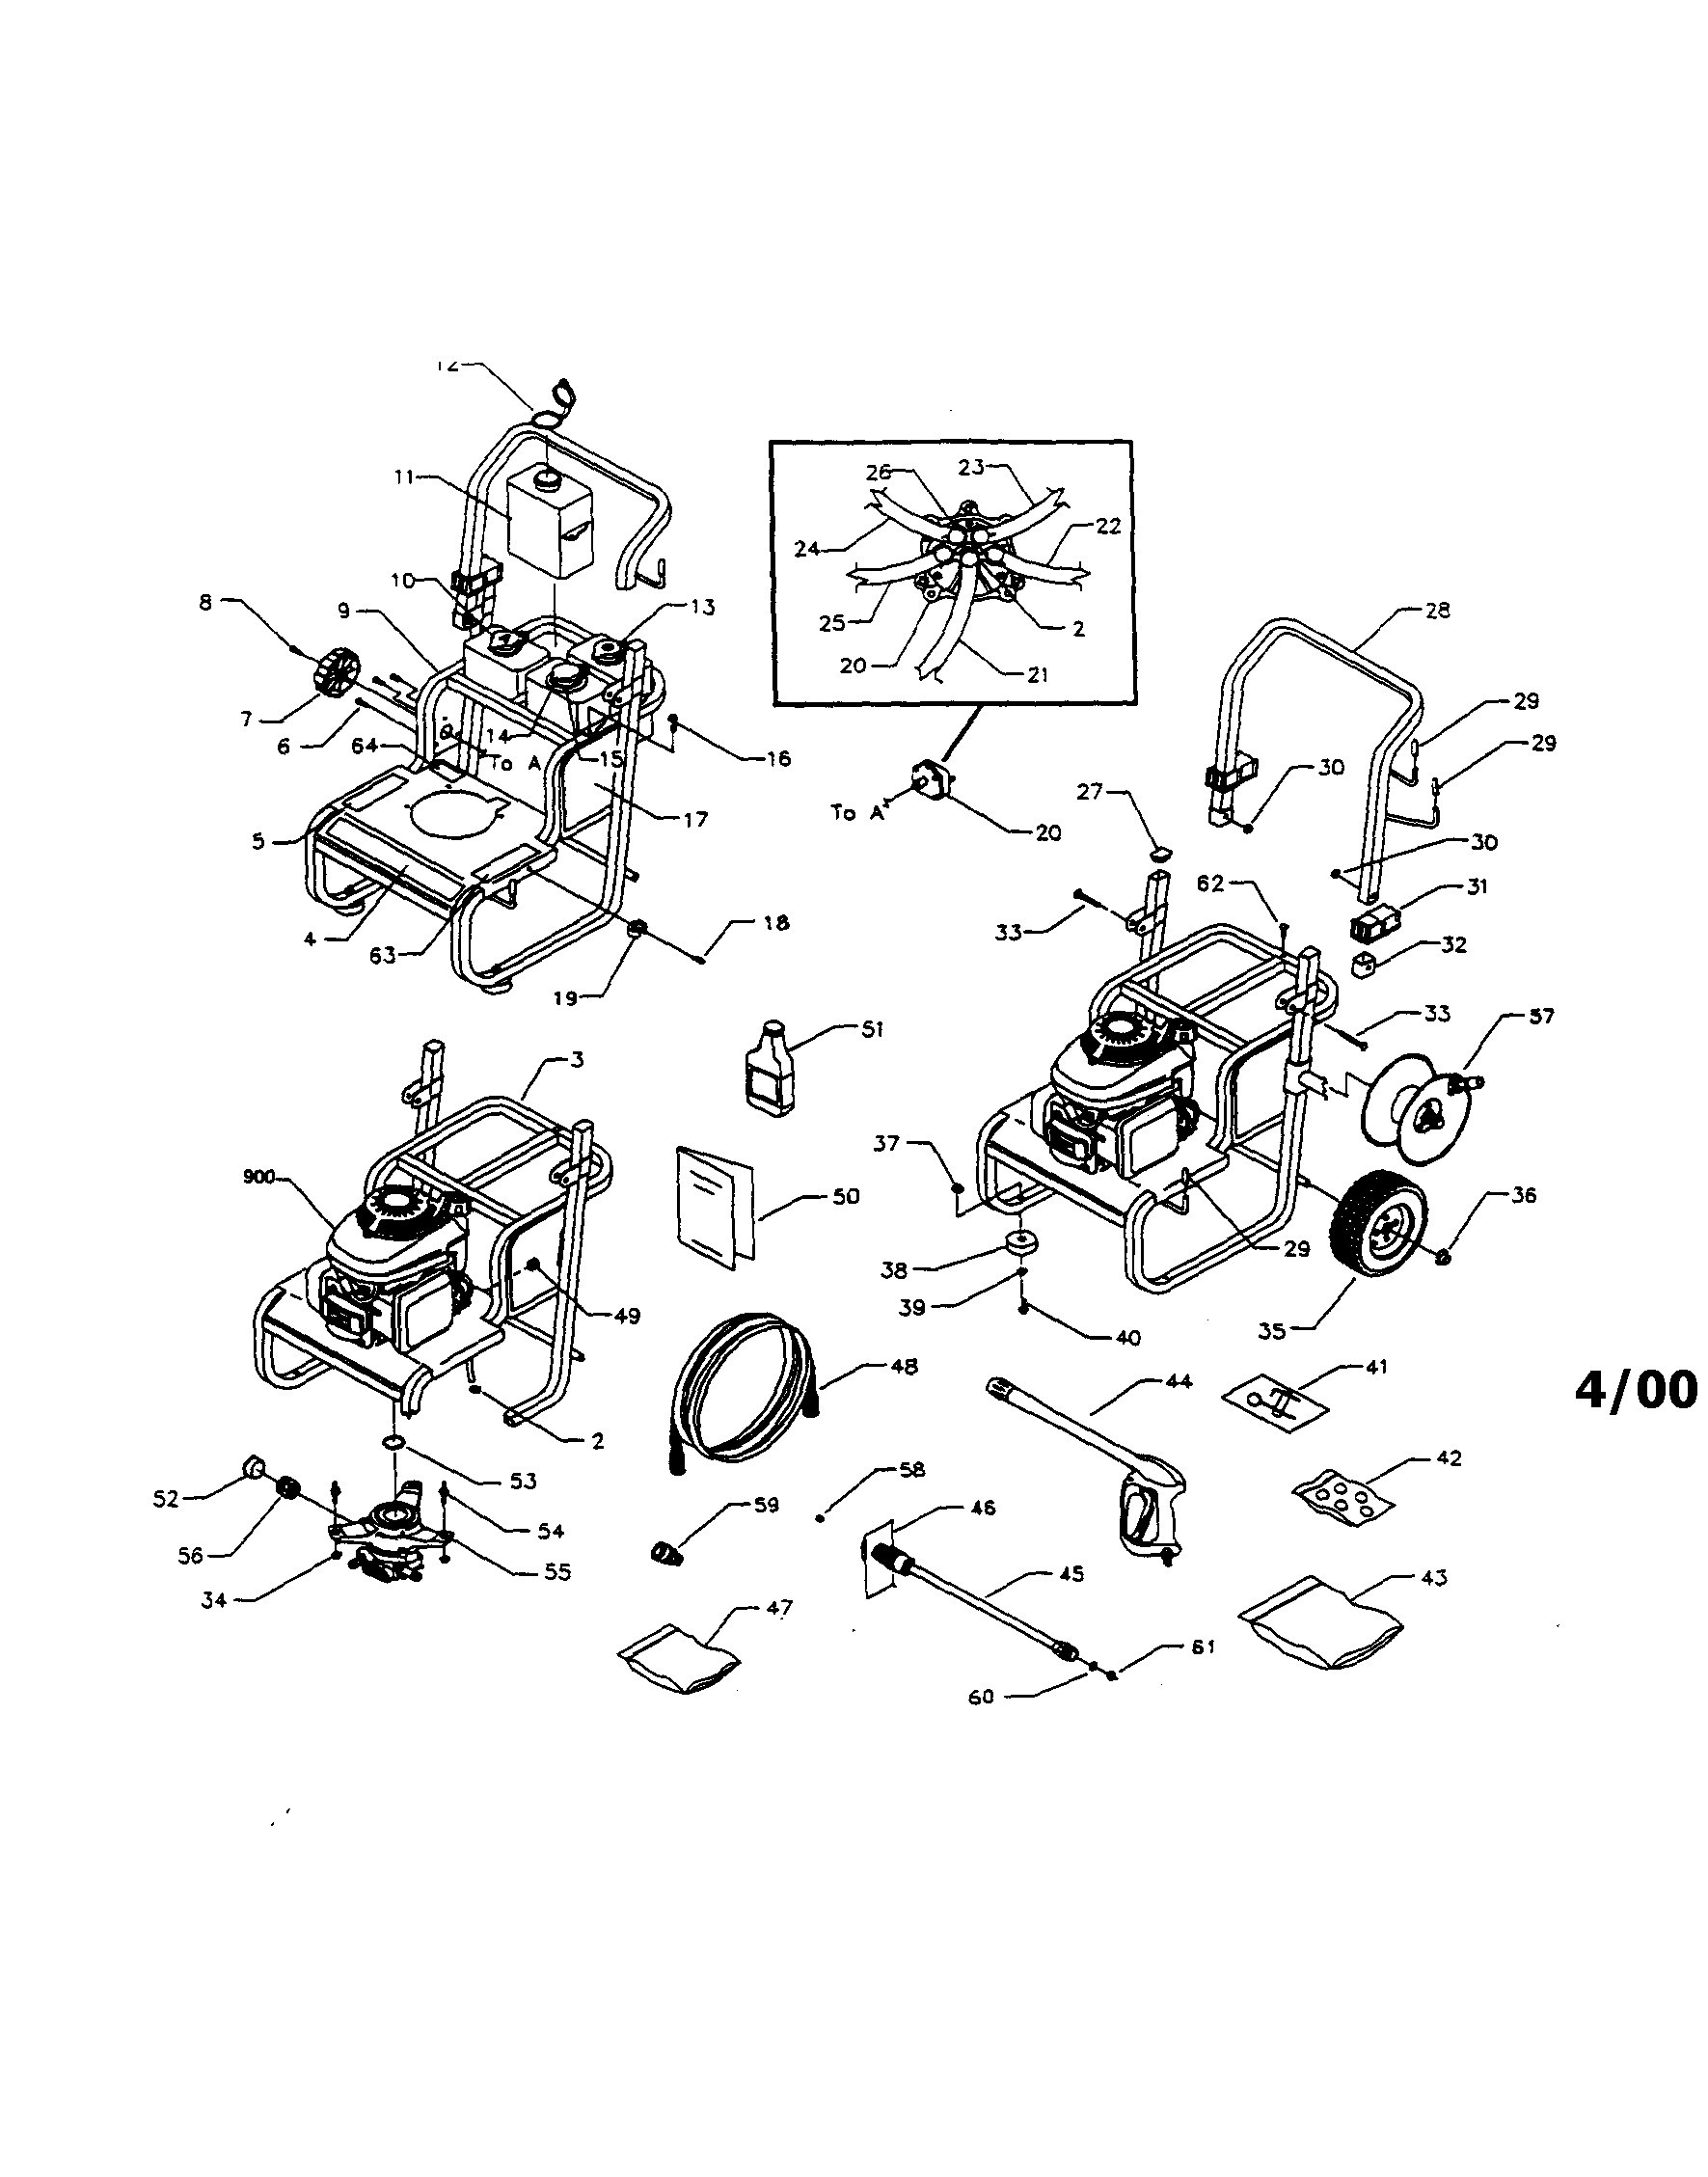 Honda Gcv160 Engine Parts Diagram Gc160 5 Craftsman Model Power Washer Gas Genuine Of